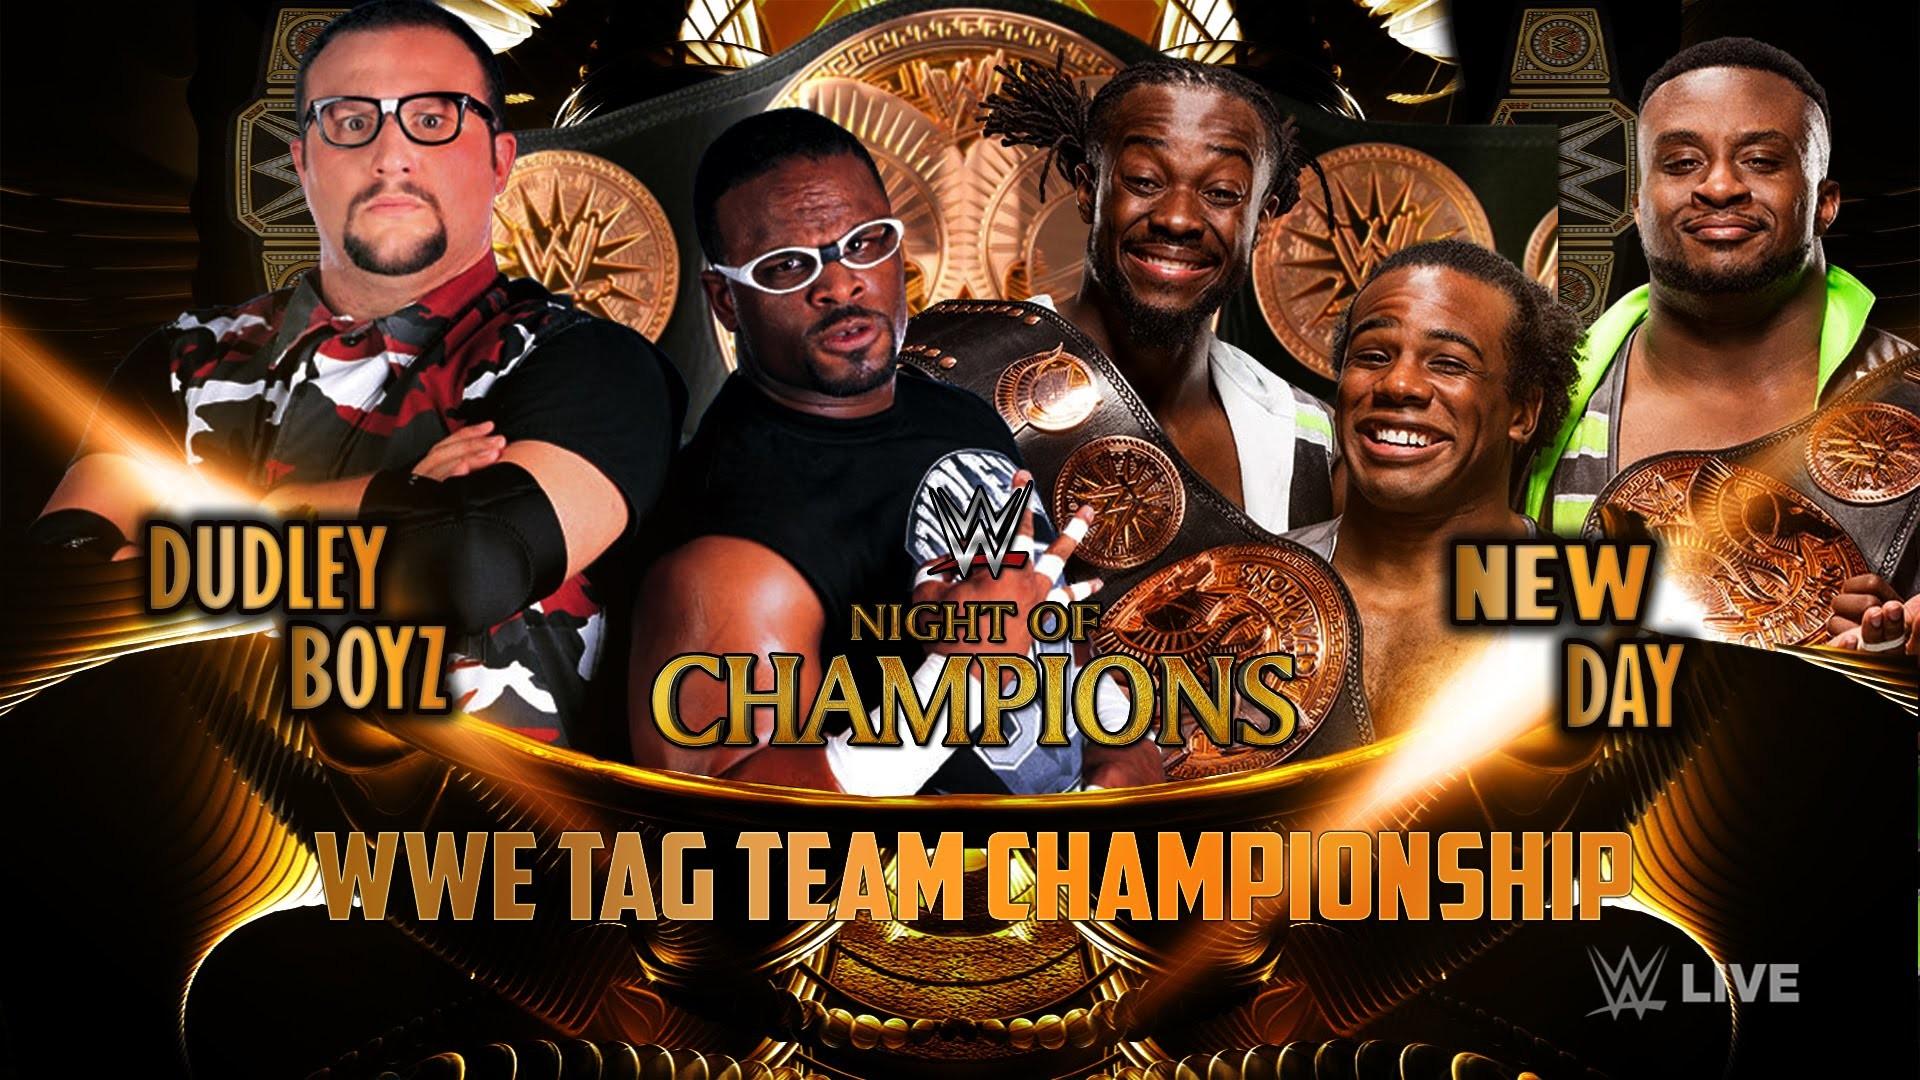 WWE Night Of Champions 2015 – Dudley Boyz Vs New Day (TagTeam Championship)  Match HD